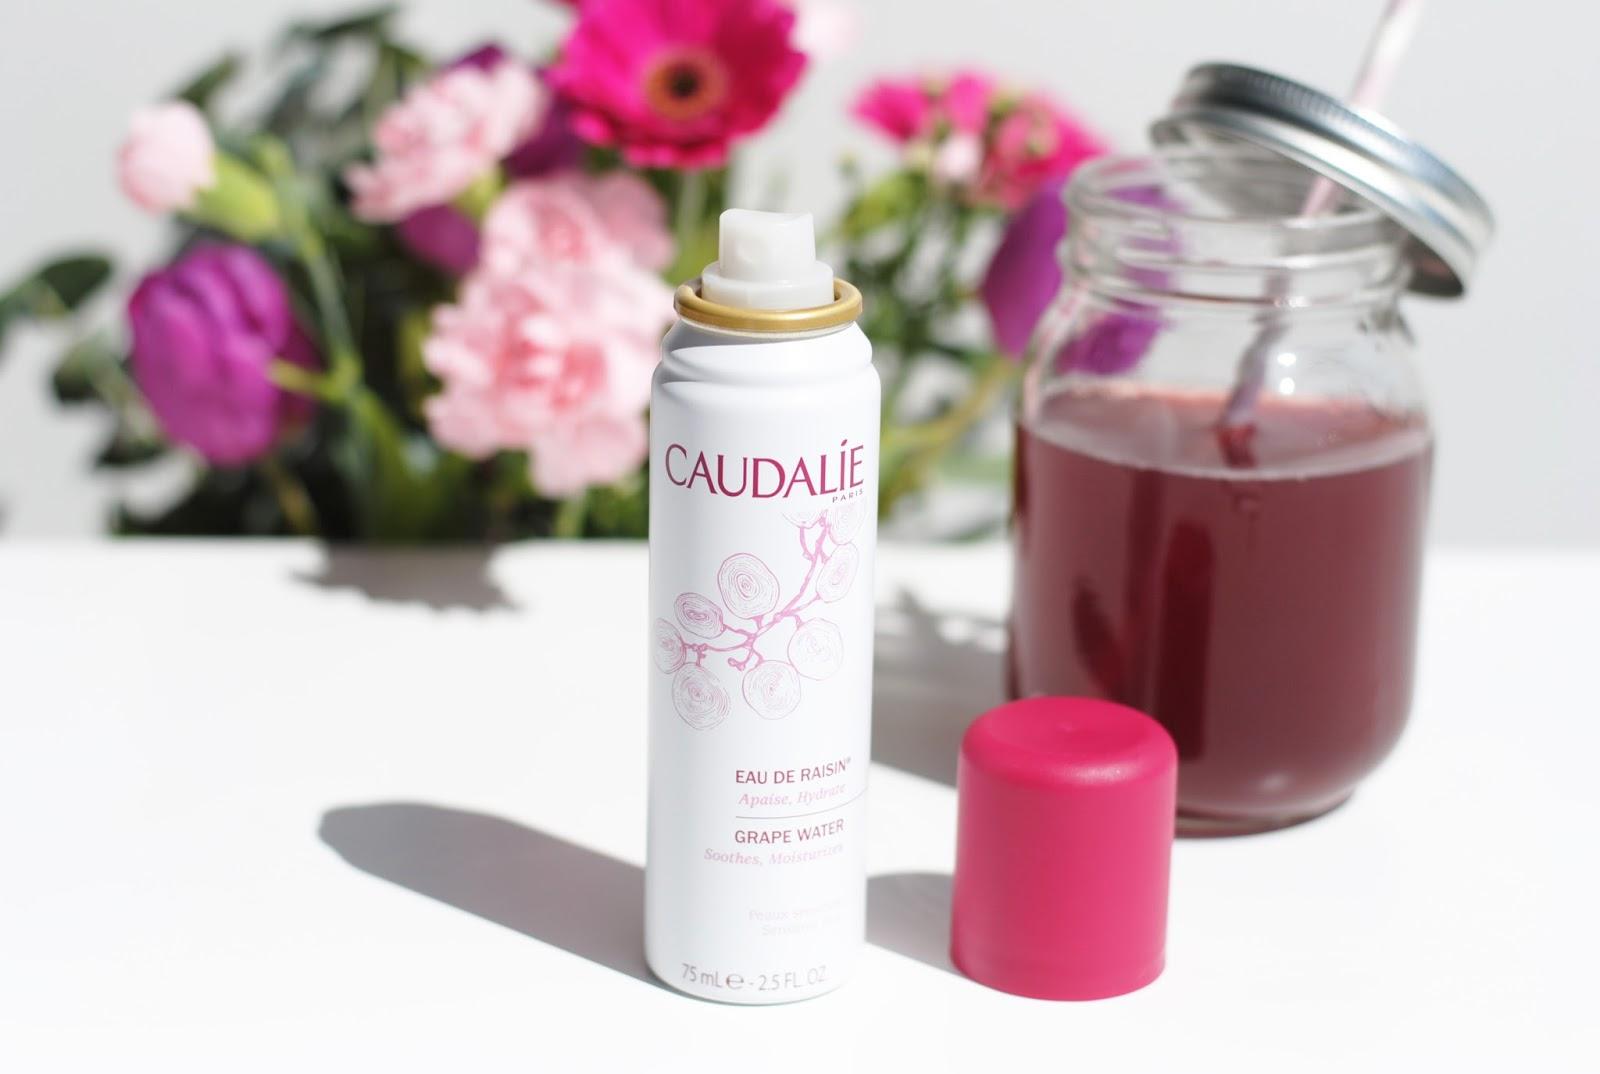 caudalie-grape-water-spray-deponline